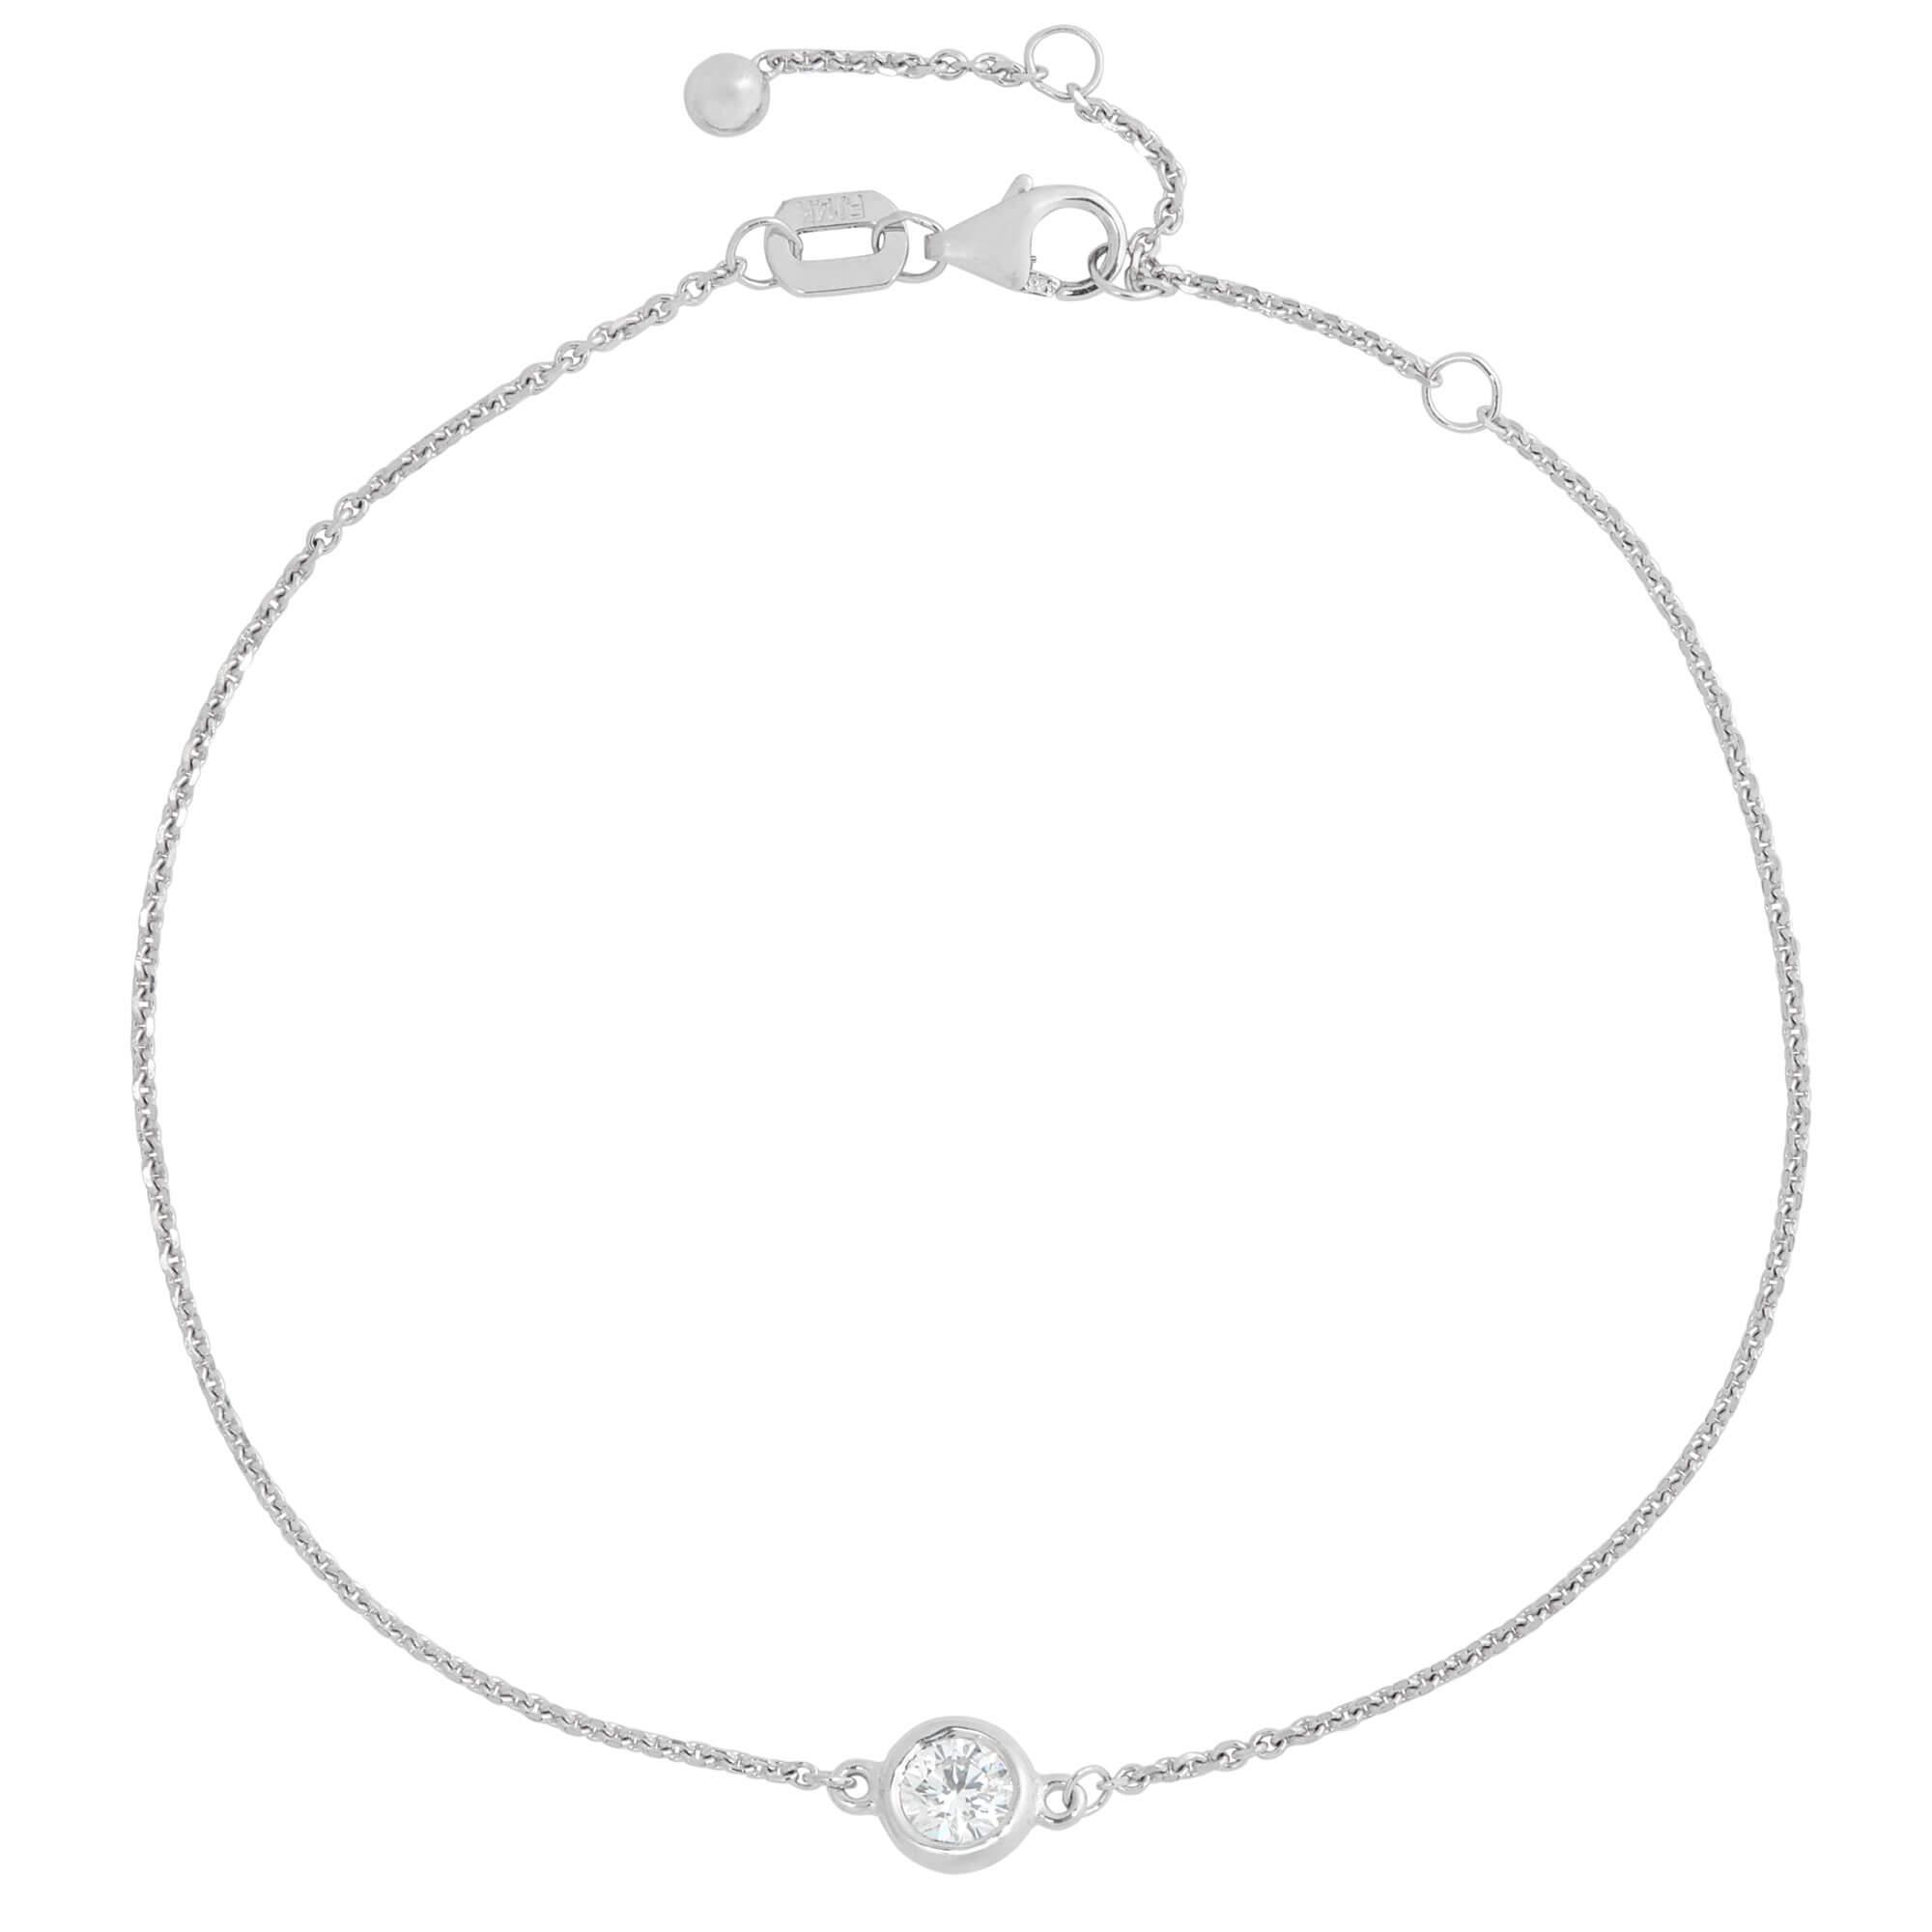 Bezel Set Diamond Bracelet 14k Ben Bridge Jeweler